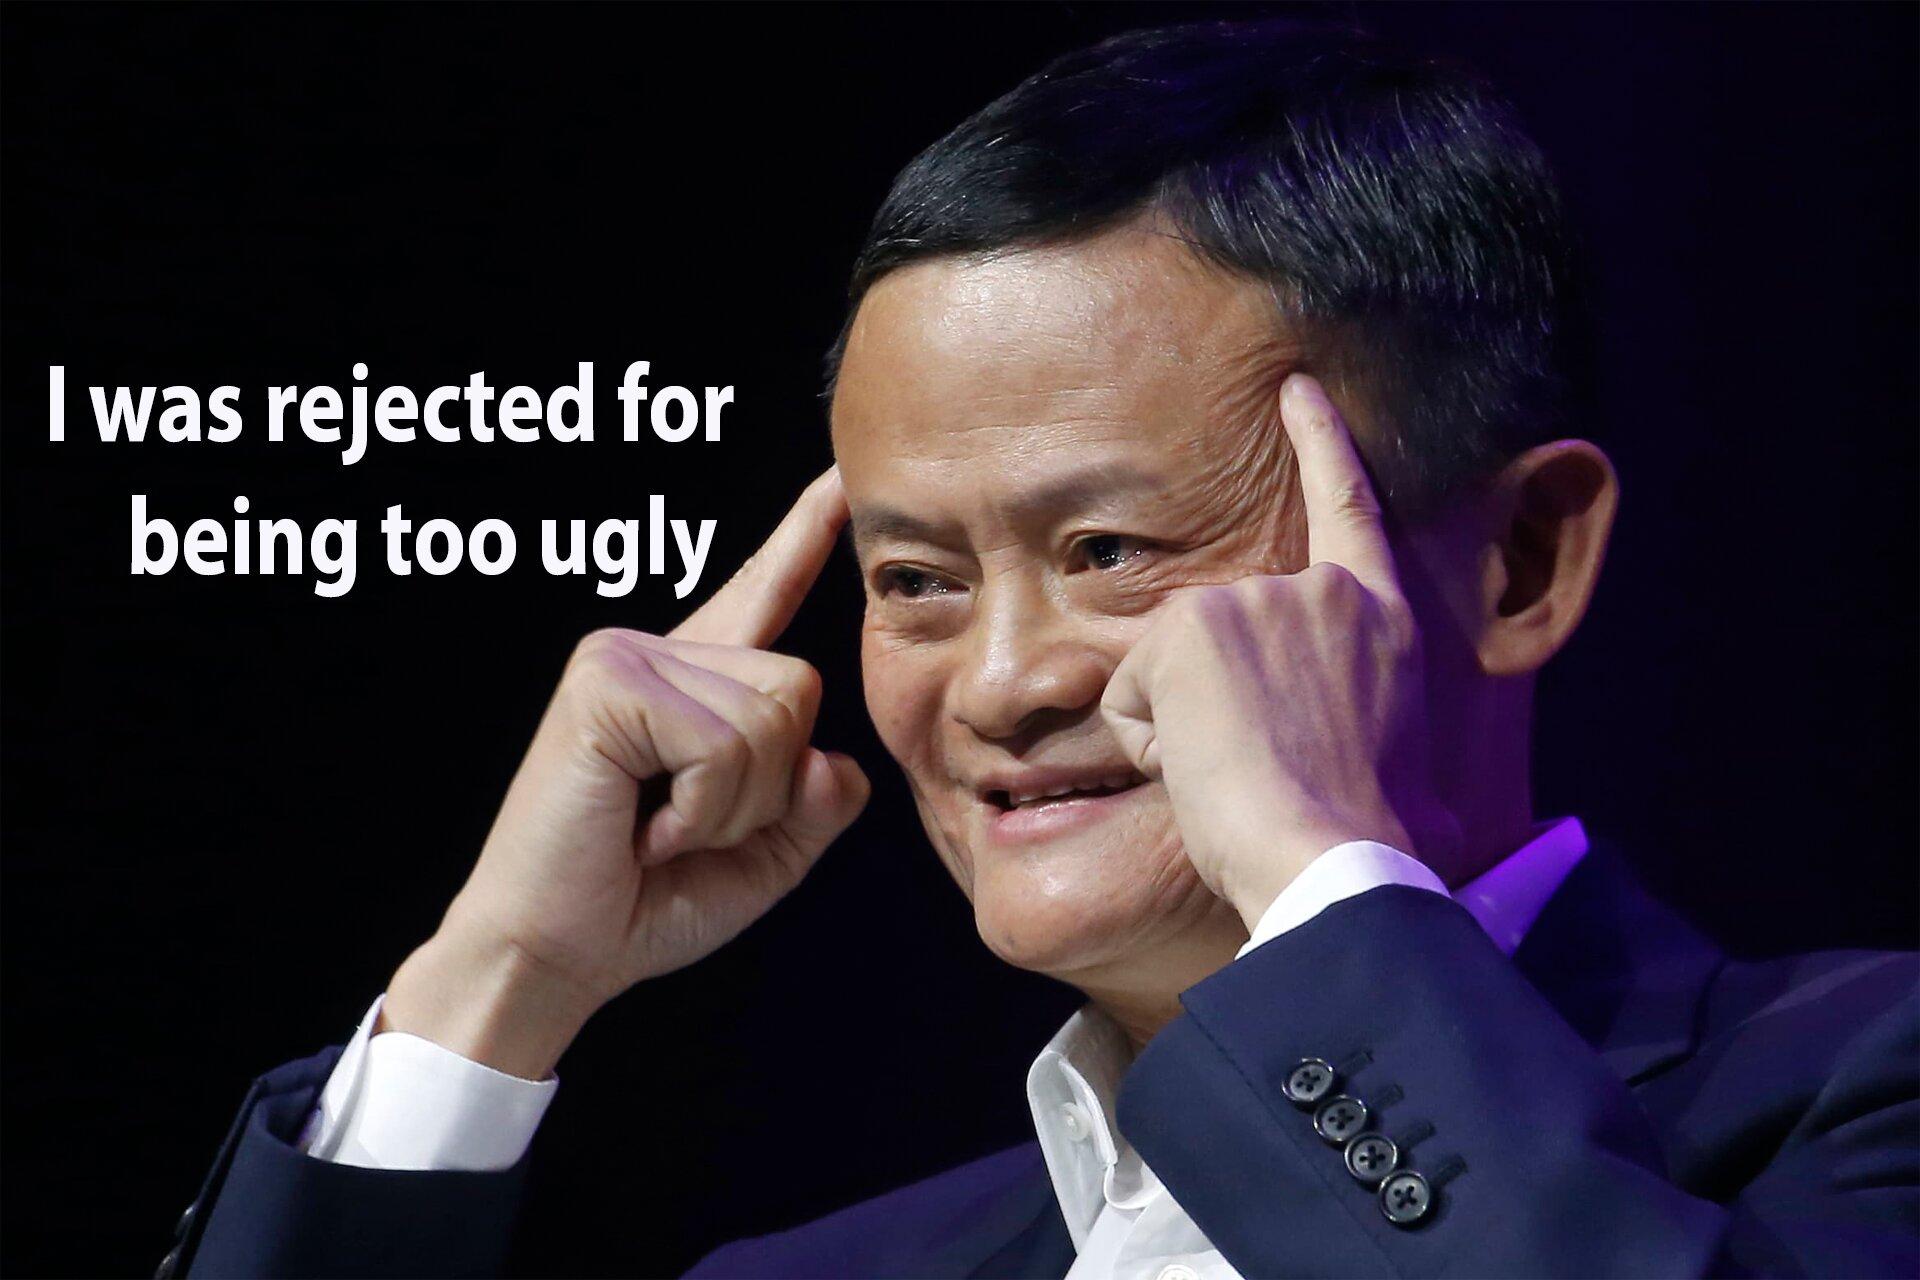 The-Story-Of-Jack-Ma-The-China-Billionaire-By-Mbonu-Watson